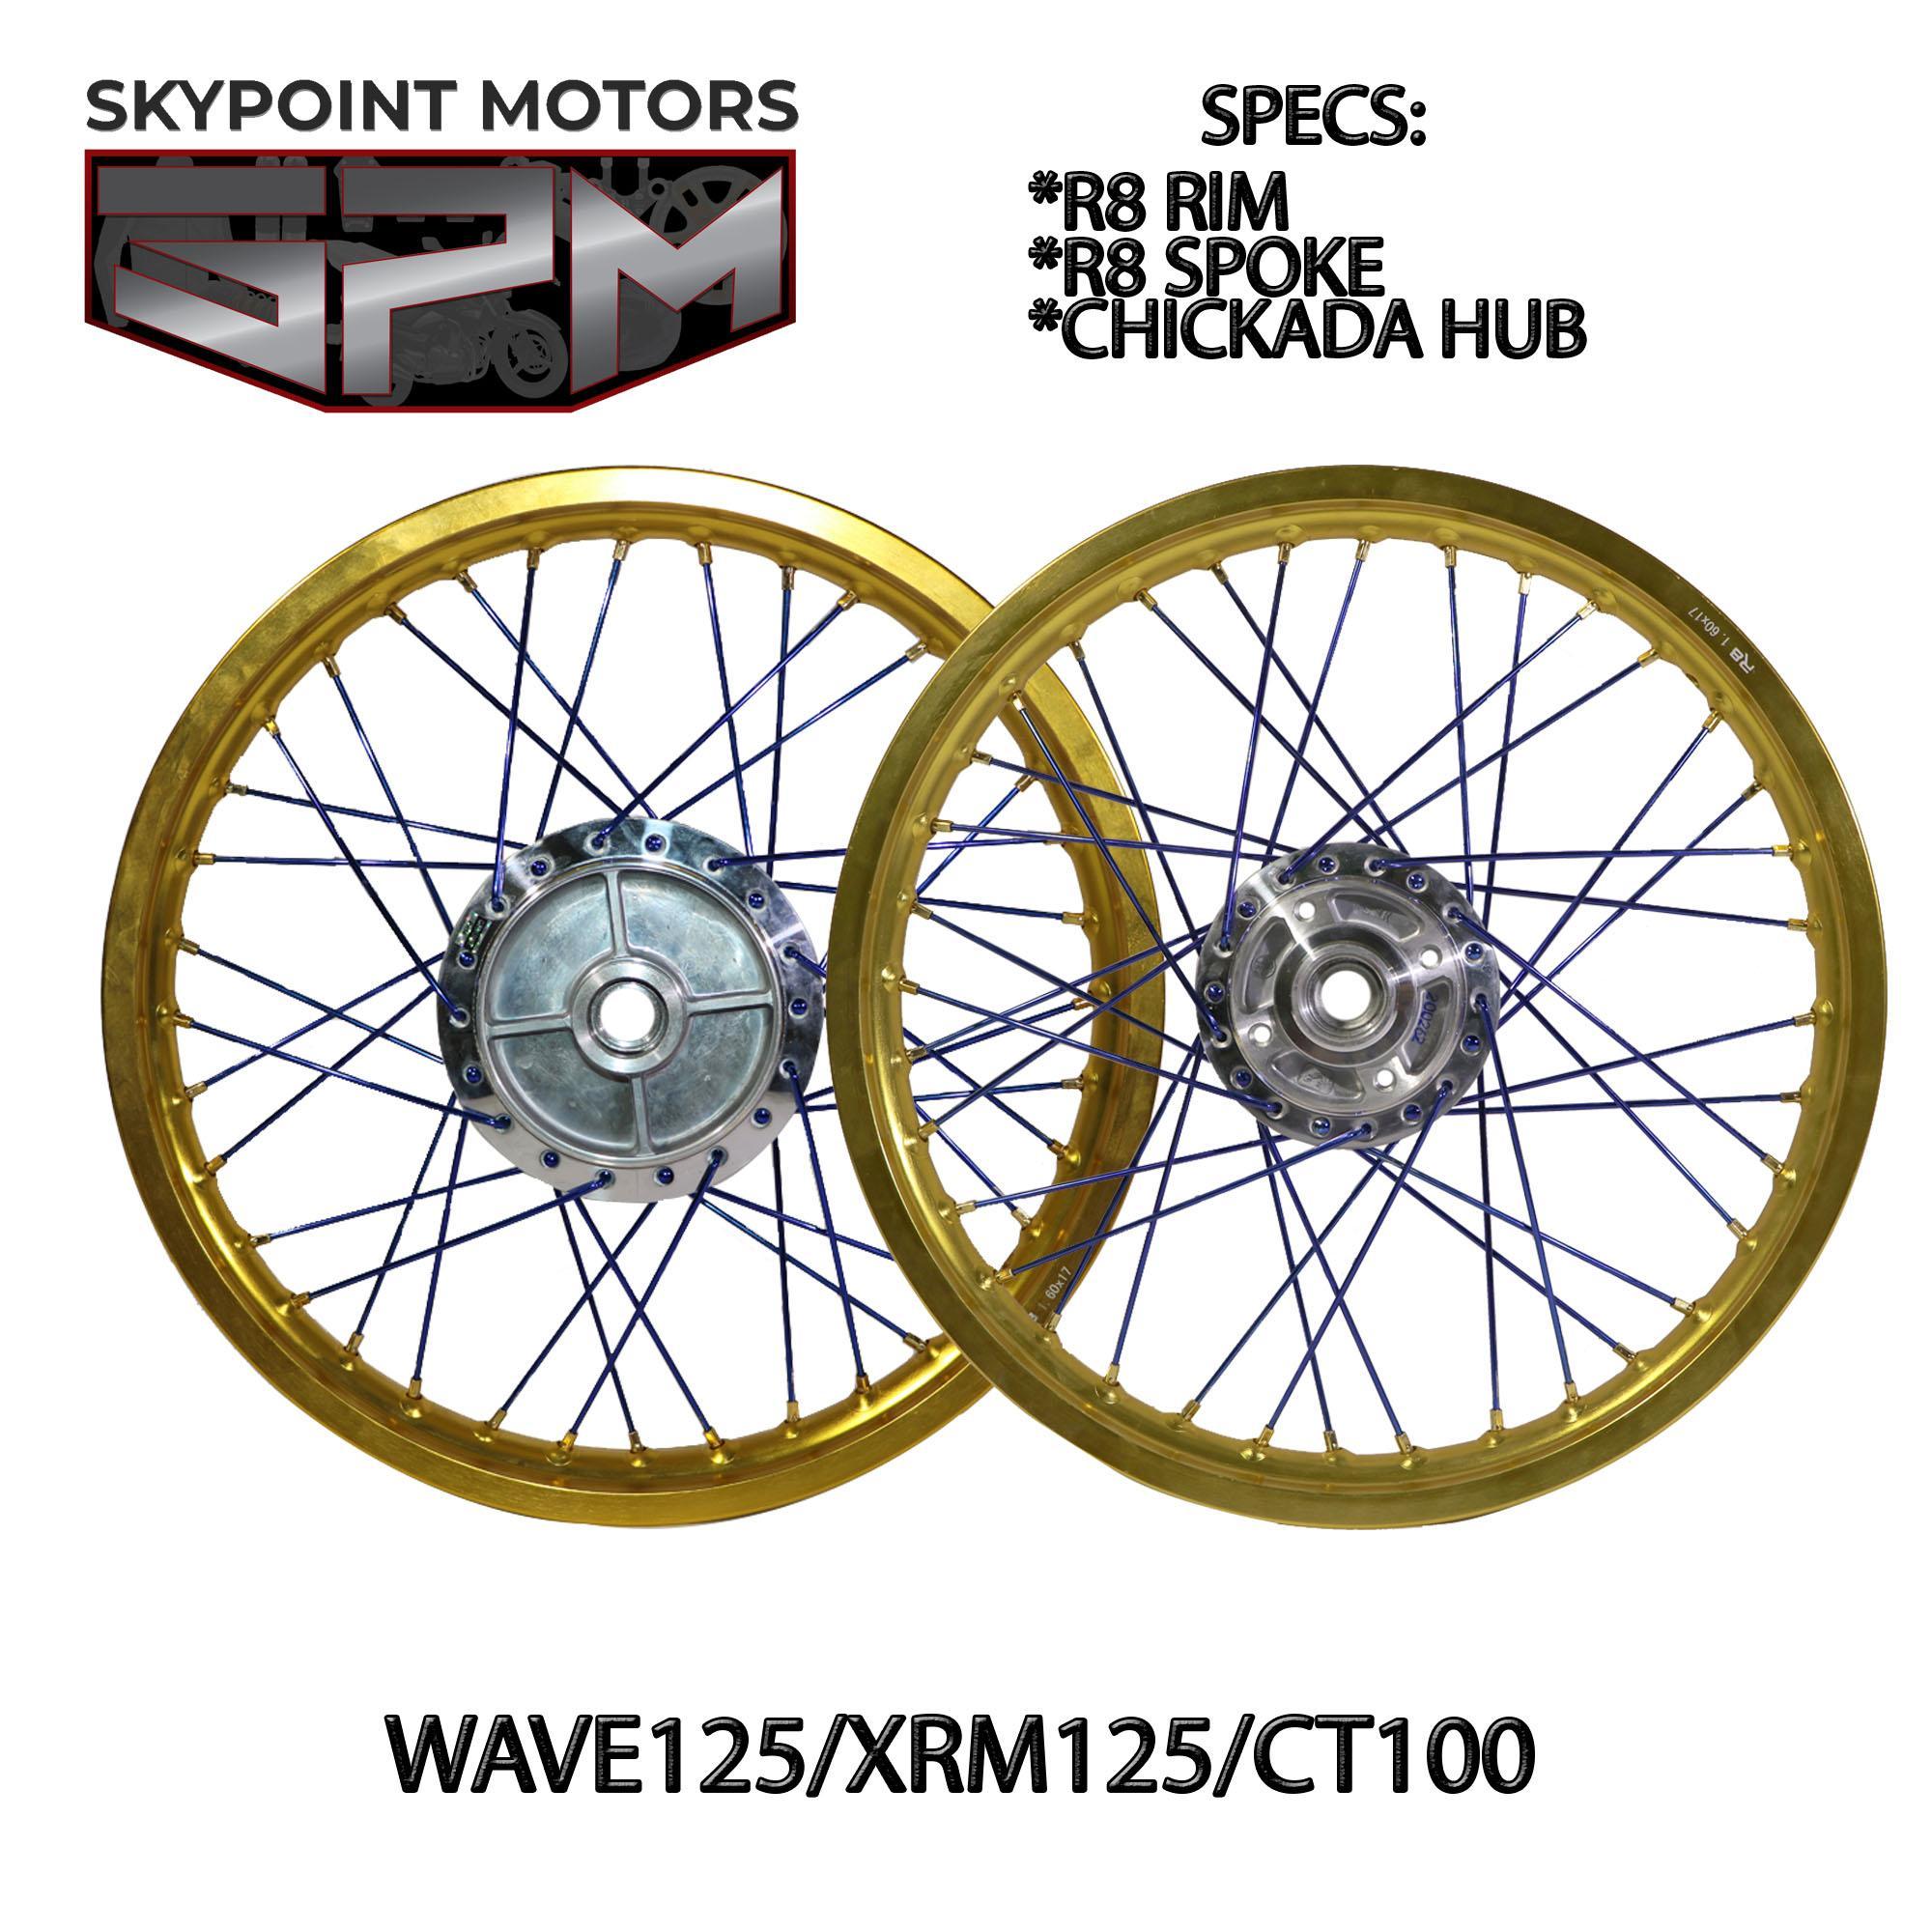 Motorcycle Tires & Wheels for sale - Motorbike Tires